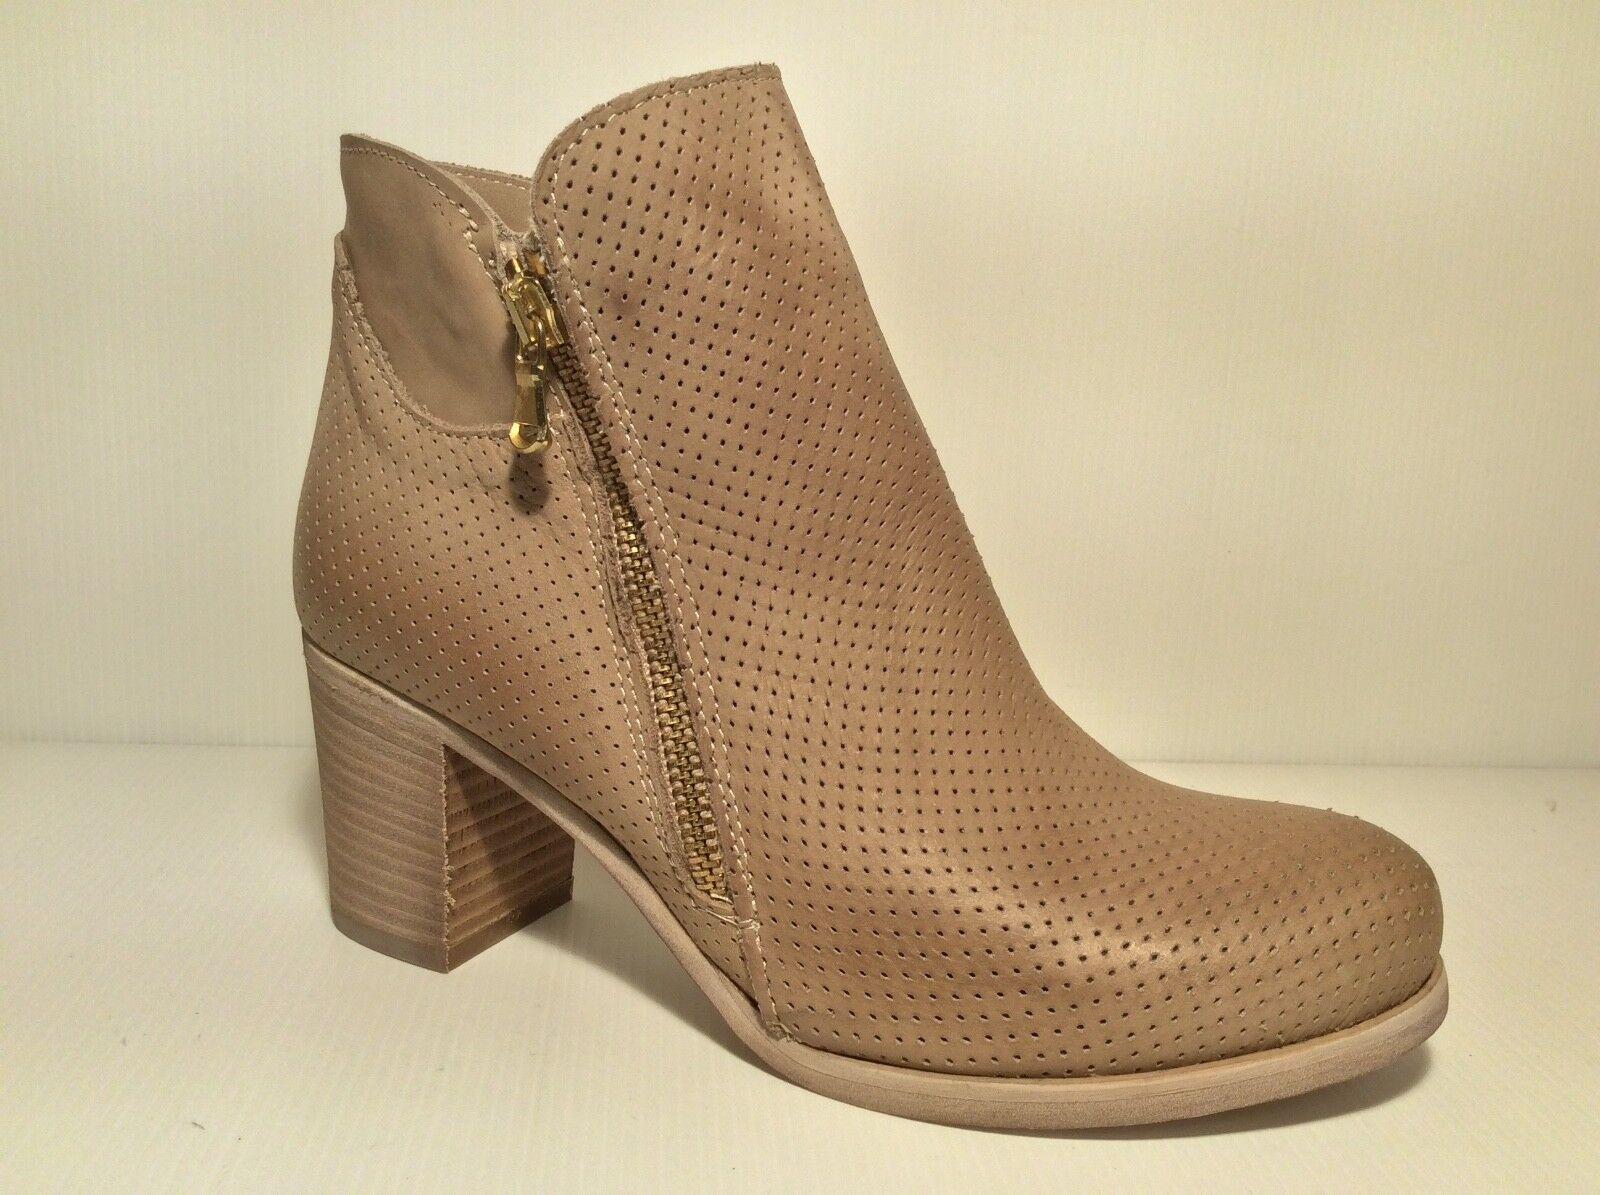 shoes STIVALETTI TRONCHETTI women ESTIVI PELLE TACCO PAOLA FIRENZE 902F  taupe